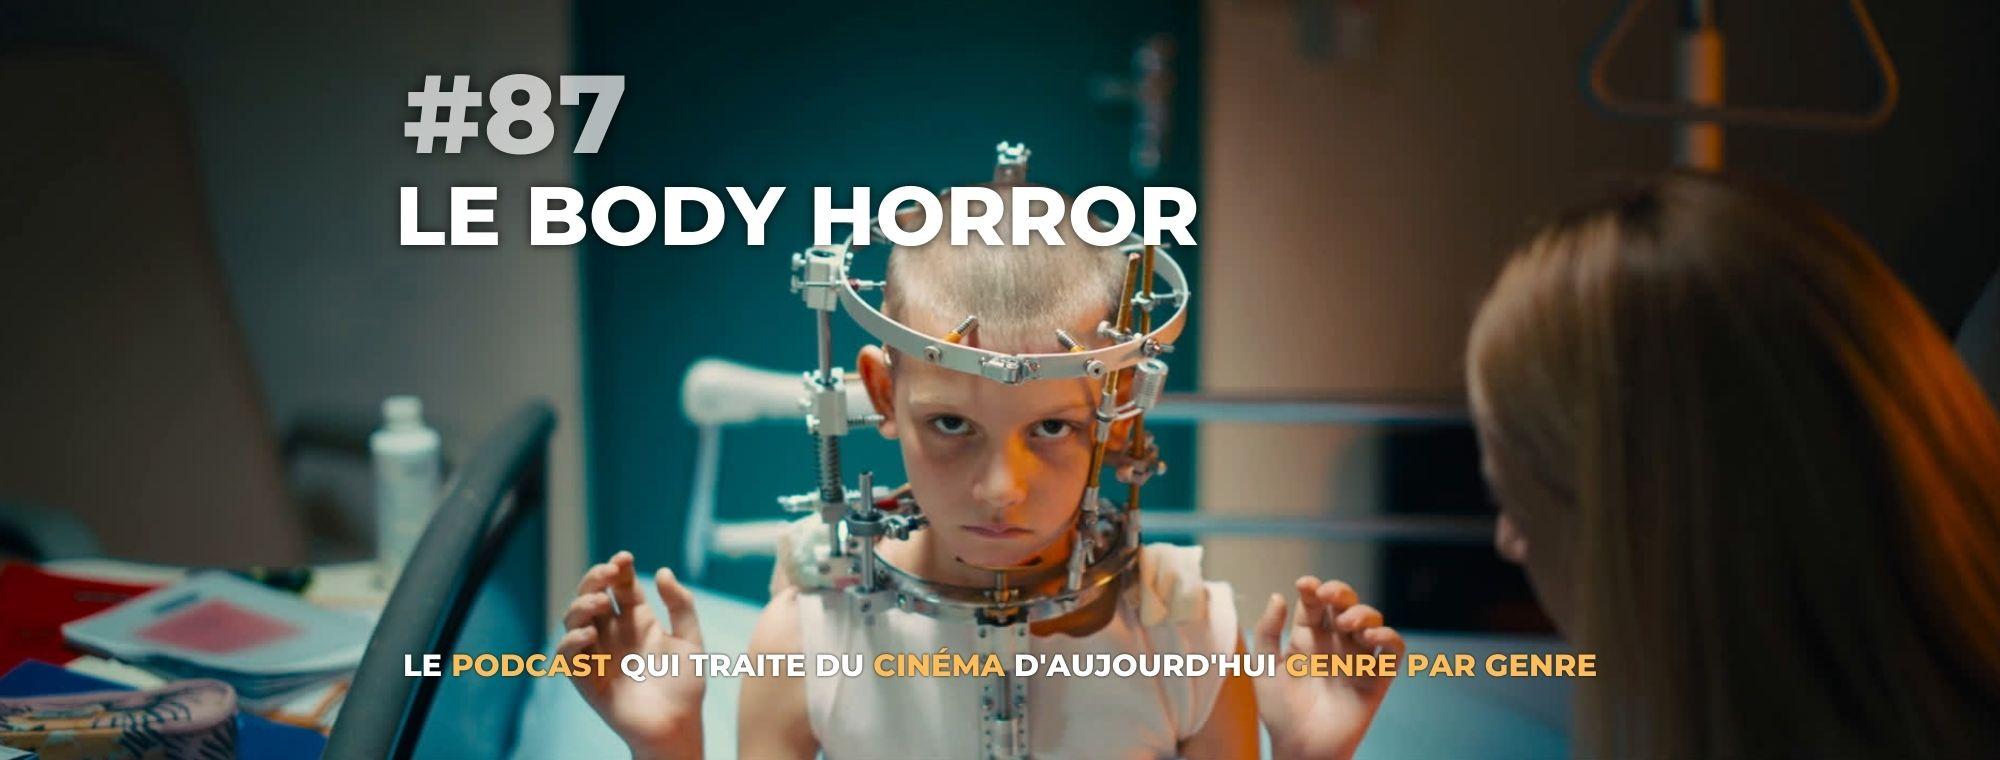 Parlons Péloches - #87 Le body horror